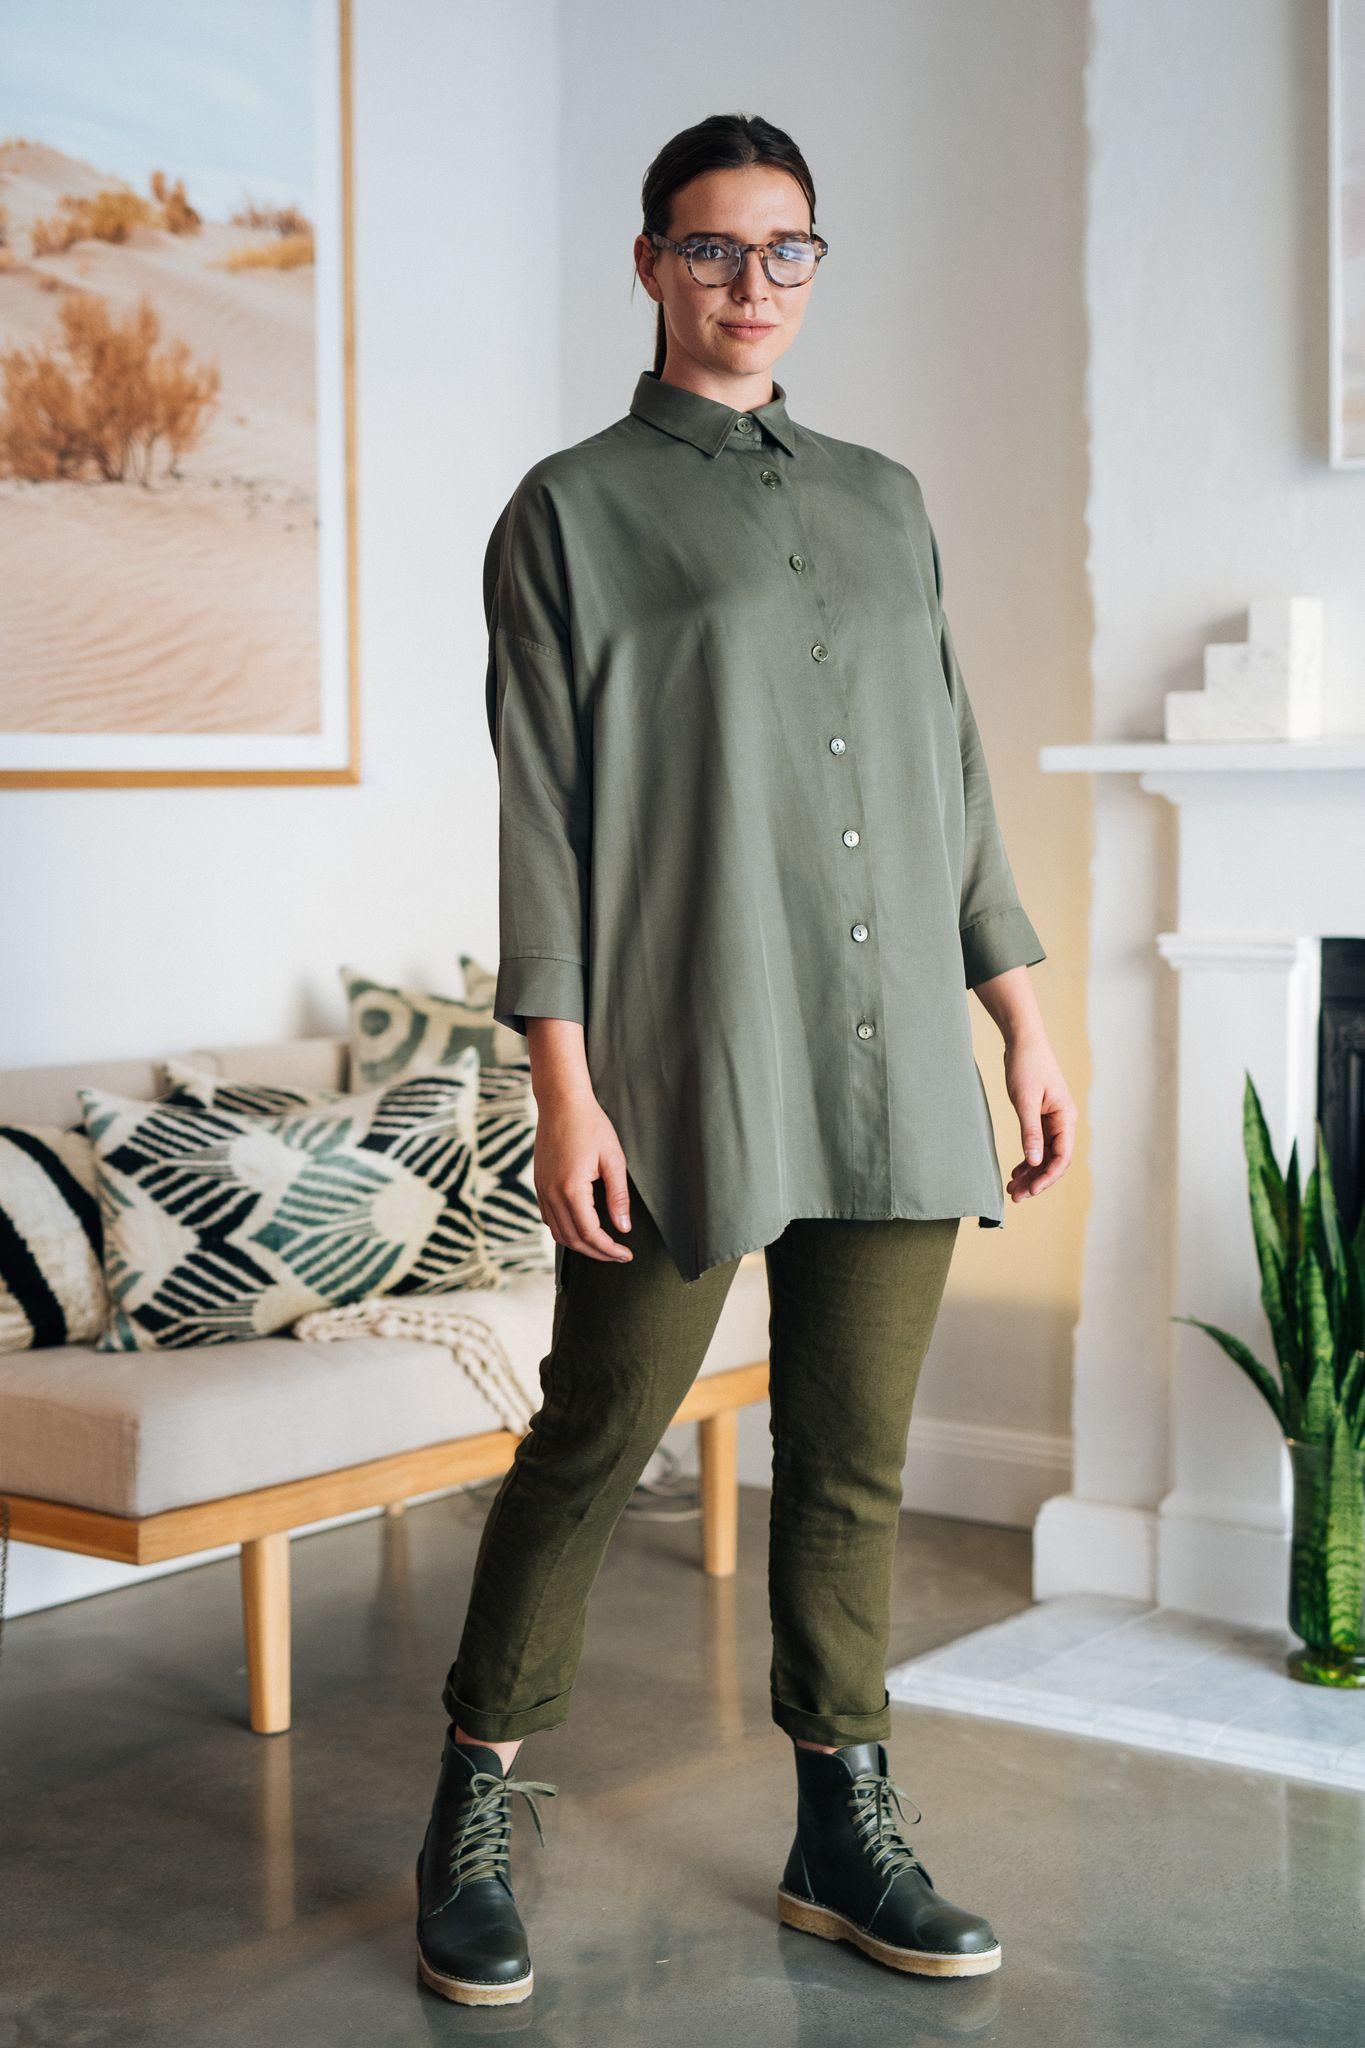 Olive shirt and pants